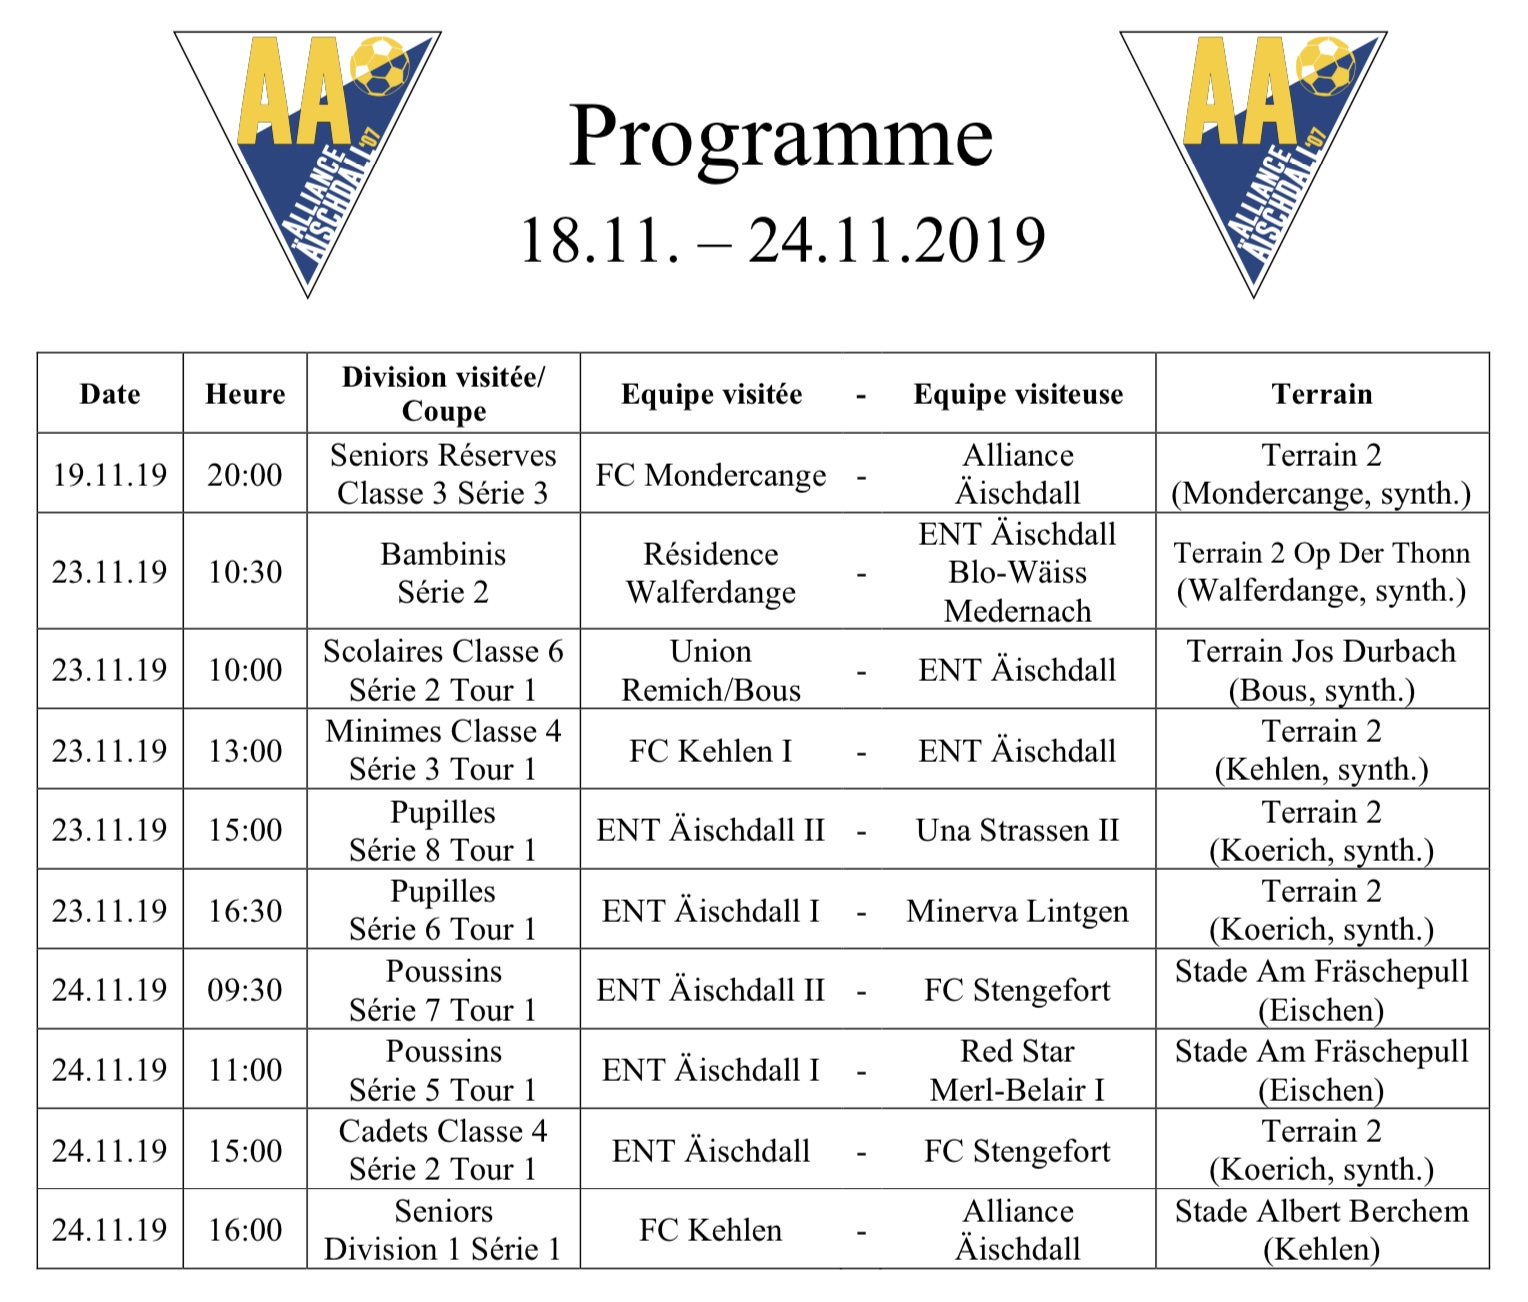 Programm 18.11.-24.11.2019